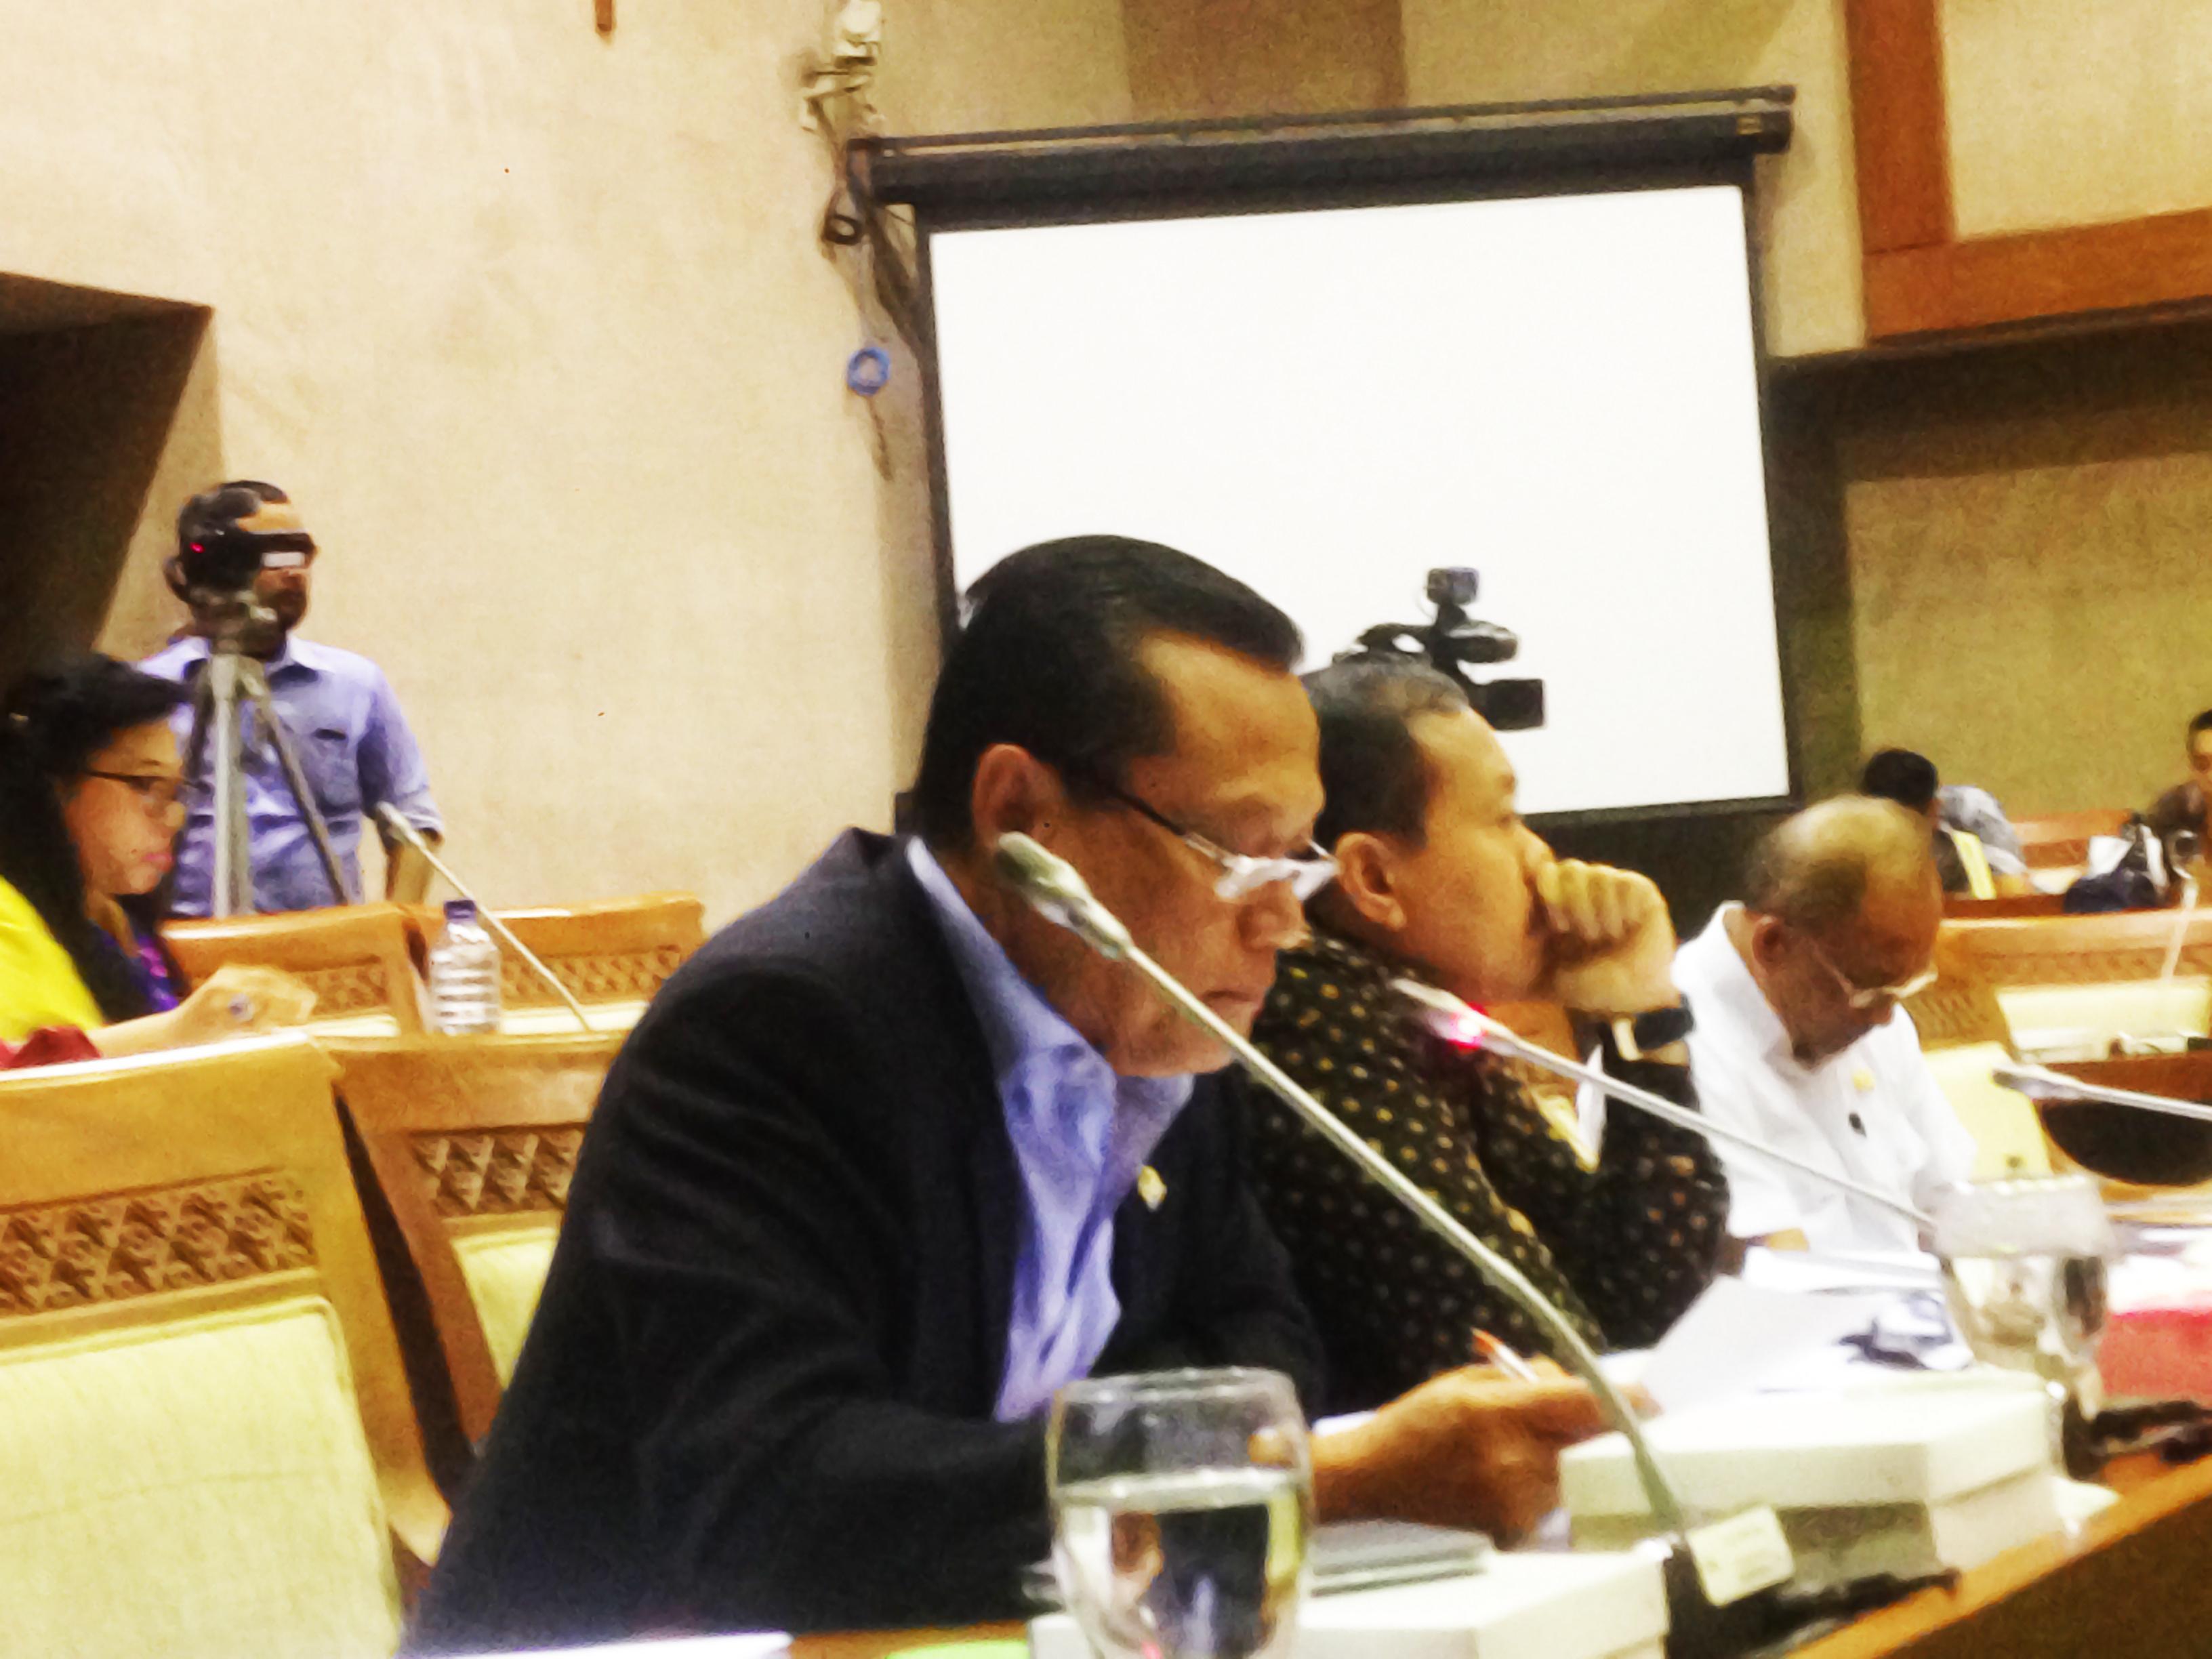 Http News Politik Dpr Berjuang Agar Dana Desa Naik Produk Ukm Bumn Sajadah Anak Laki Adang Daradjatun Panja Gula